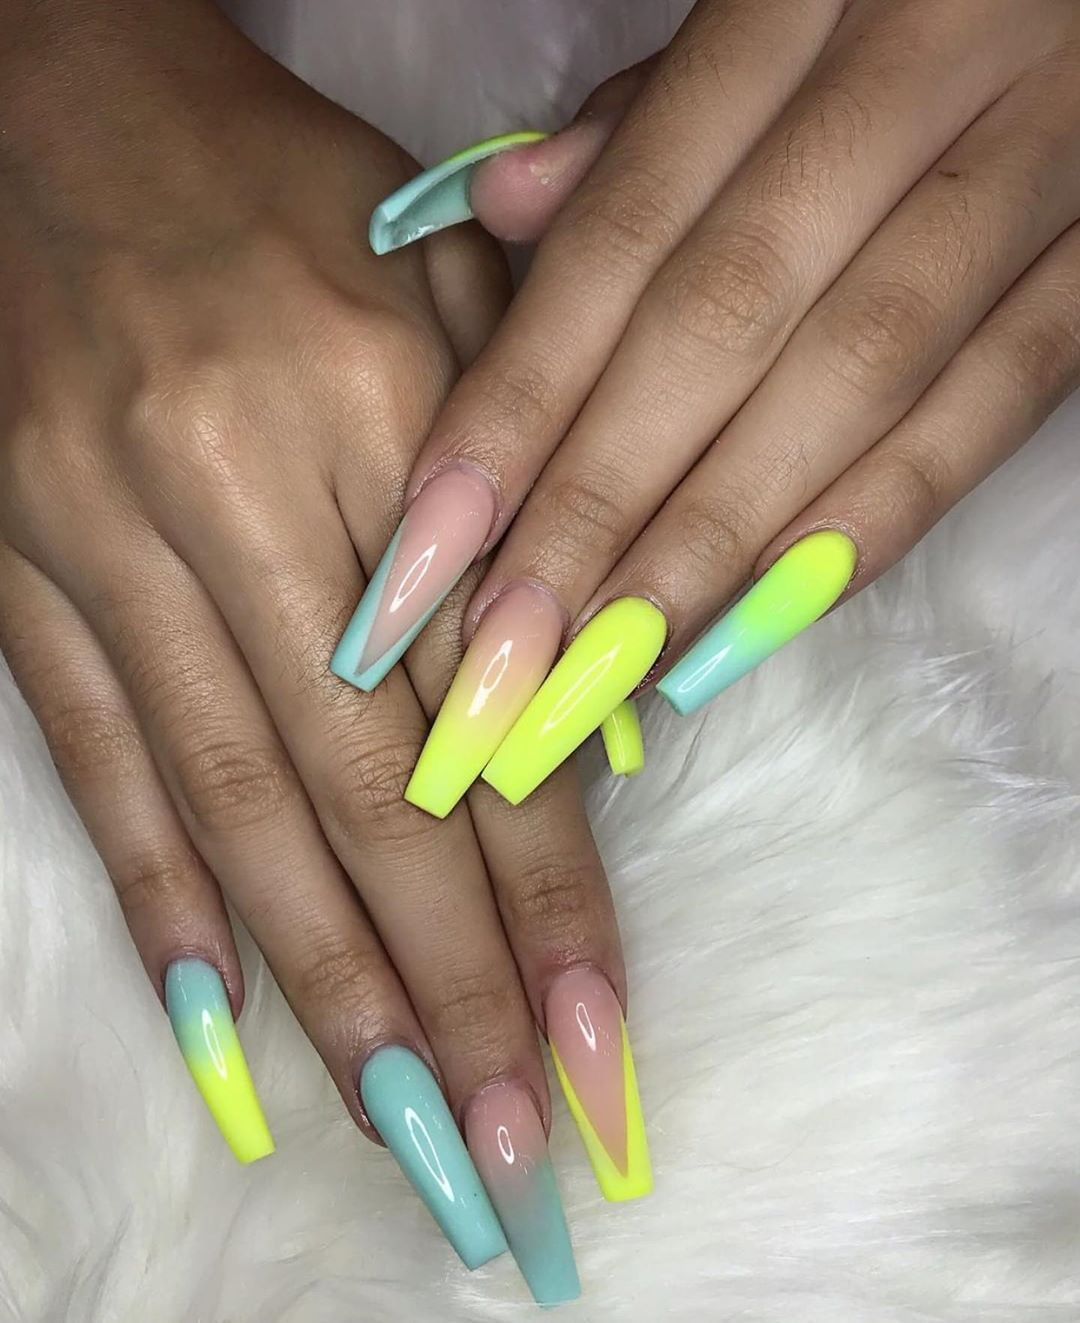 Black Girls Do Nails On Instagram Marilynbeauty Blackgirlsdonails Bgdn Long Acrylic Nails Rainbow Nails Best Acrylic Nails